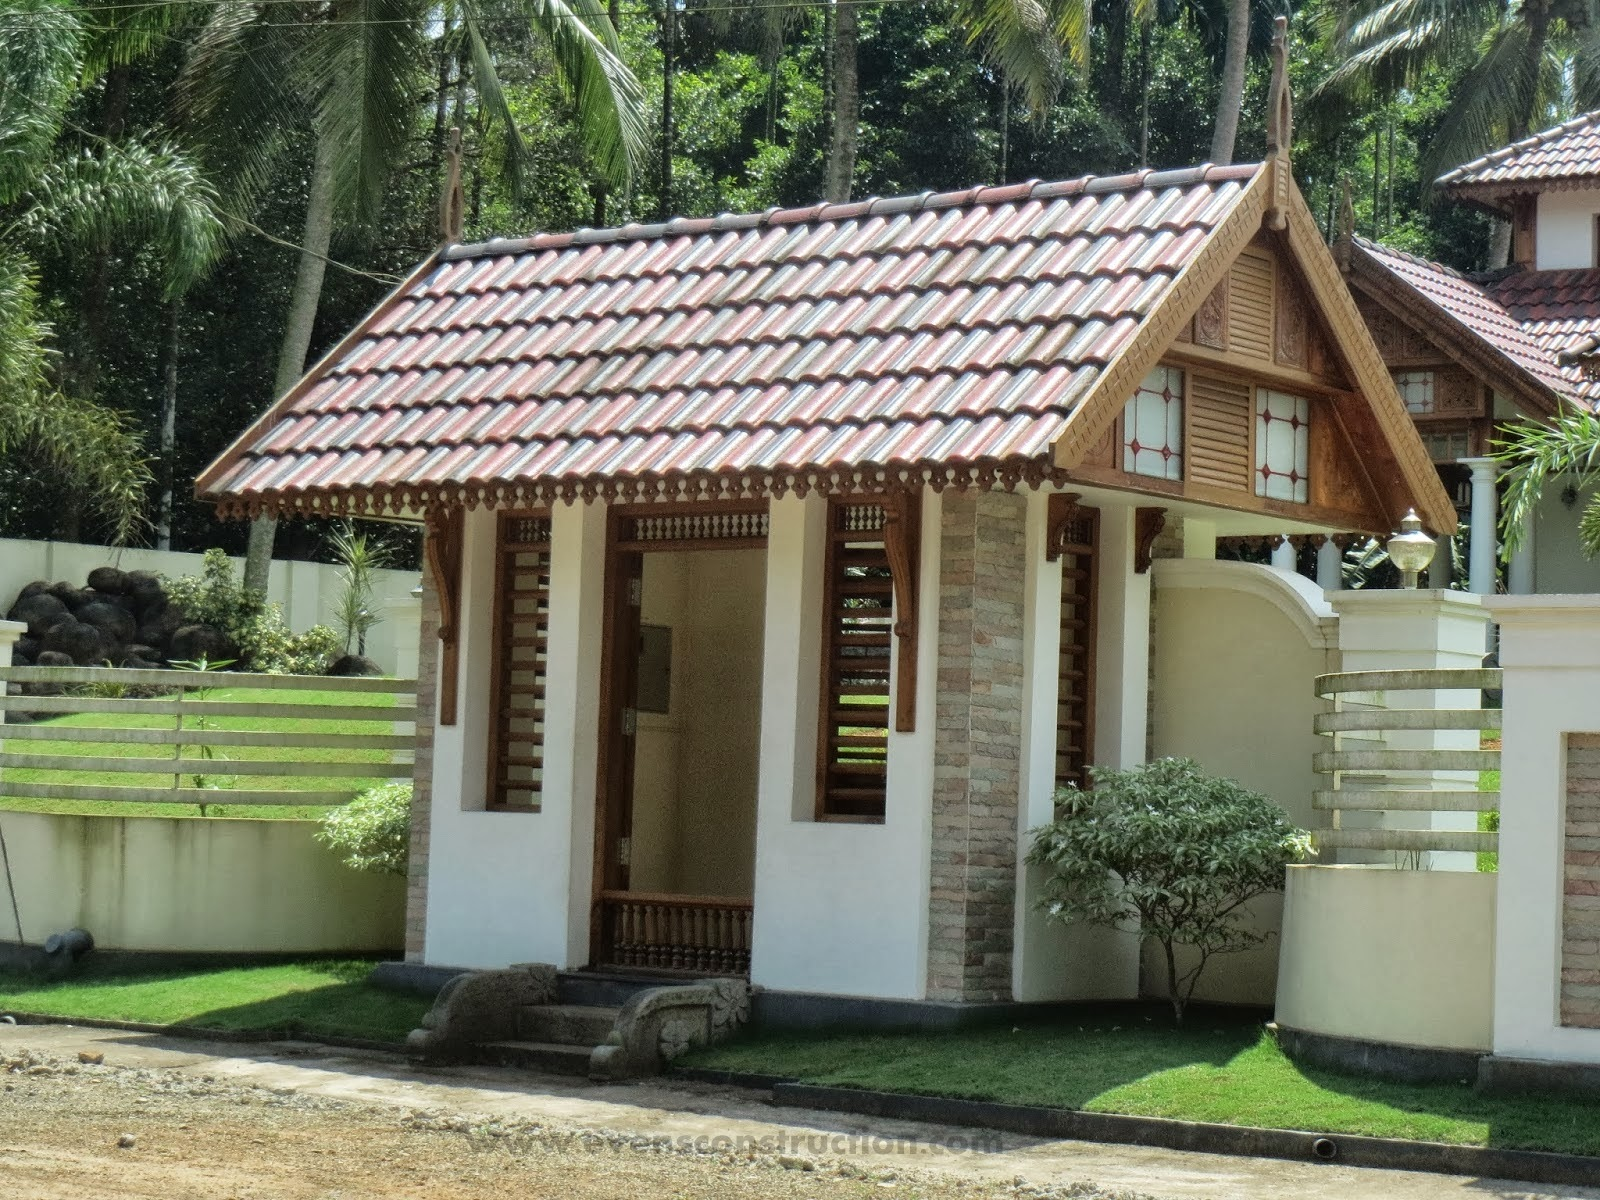 Evens construction pvt ltd compound walls and gates for House compound designs pictures